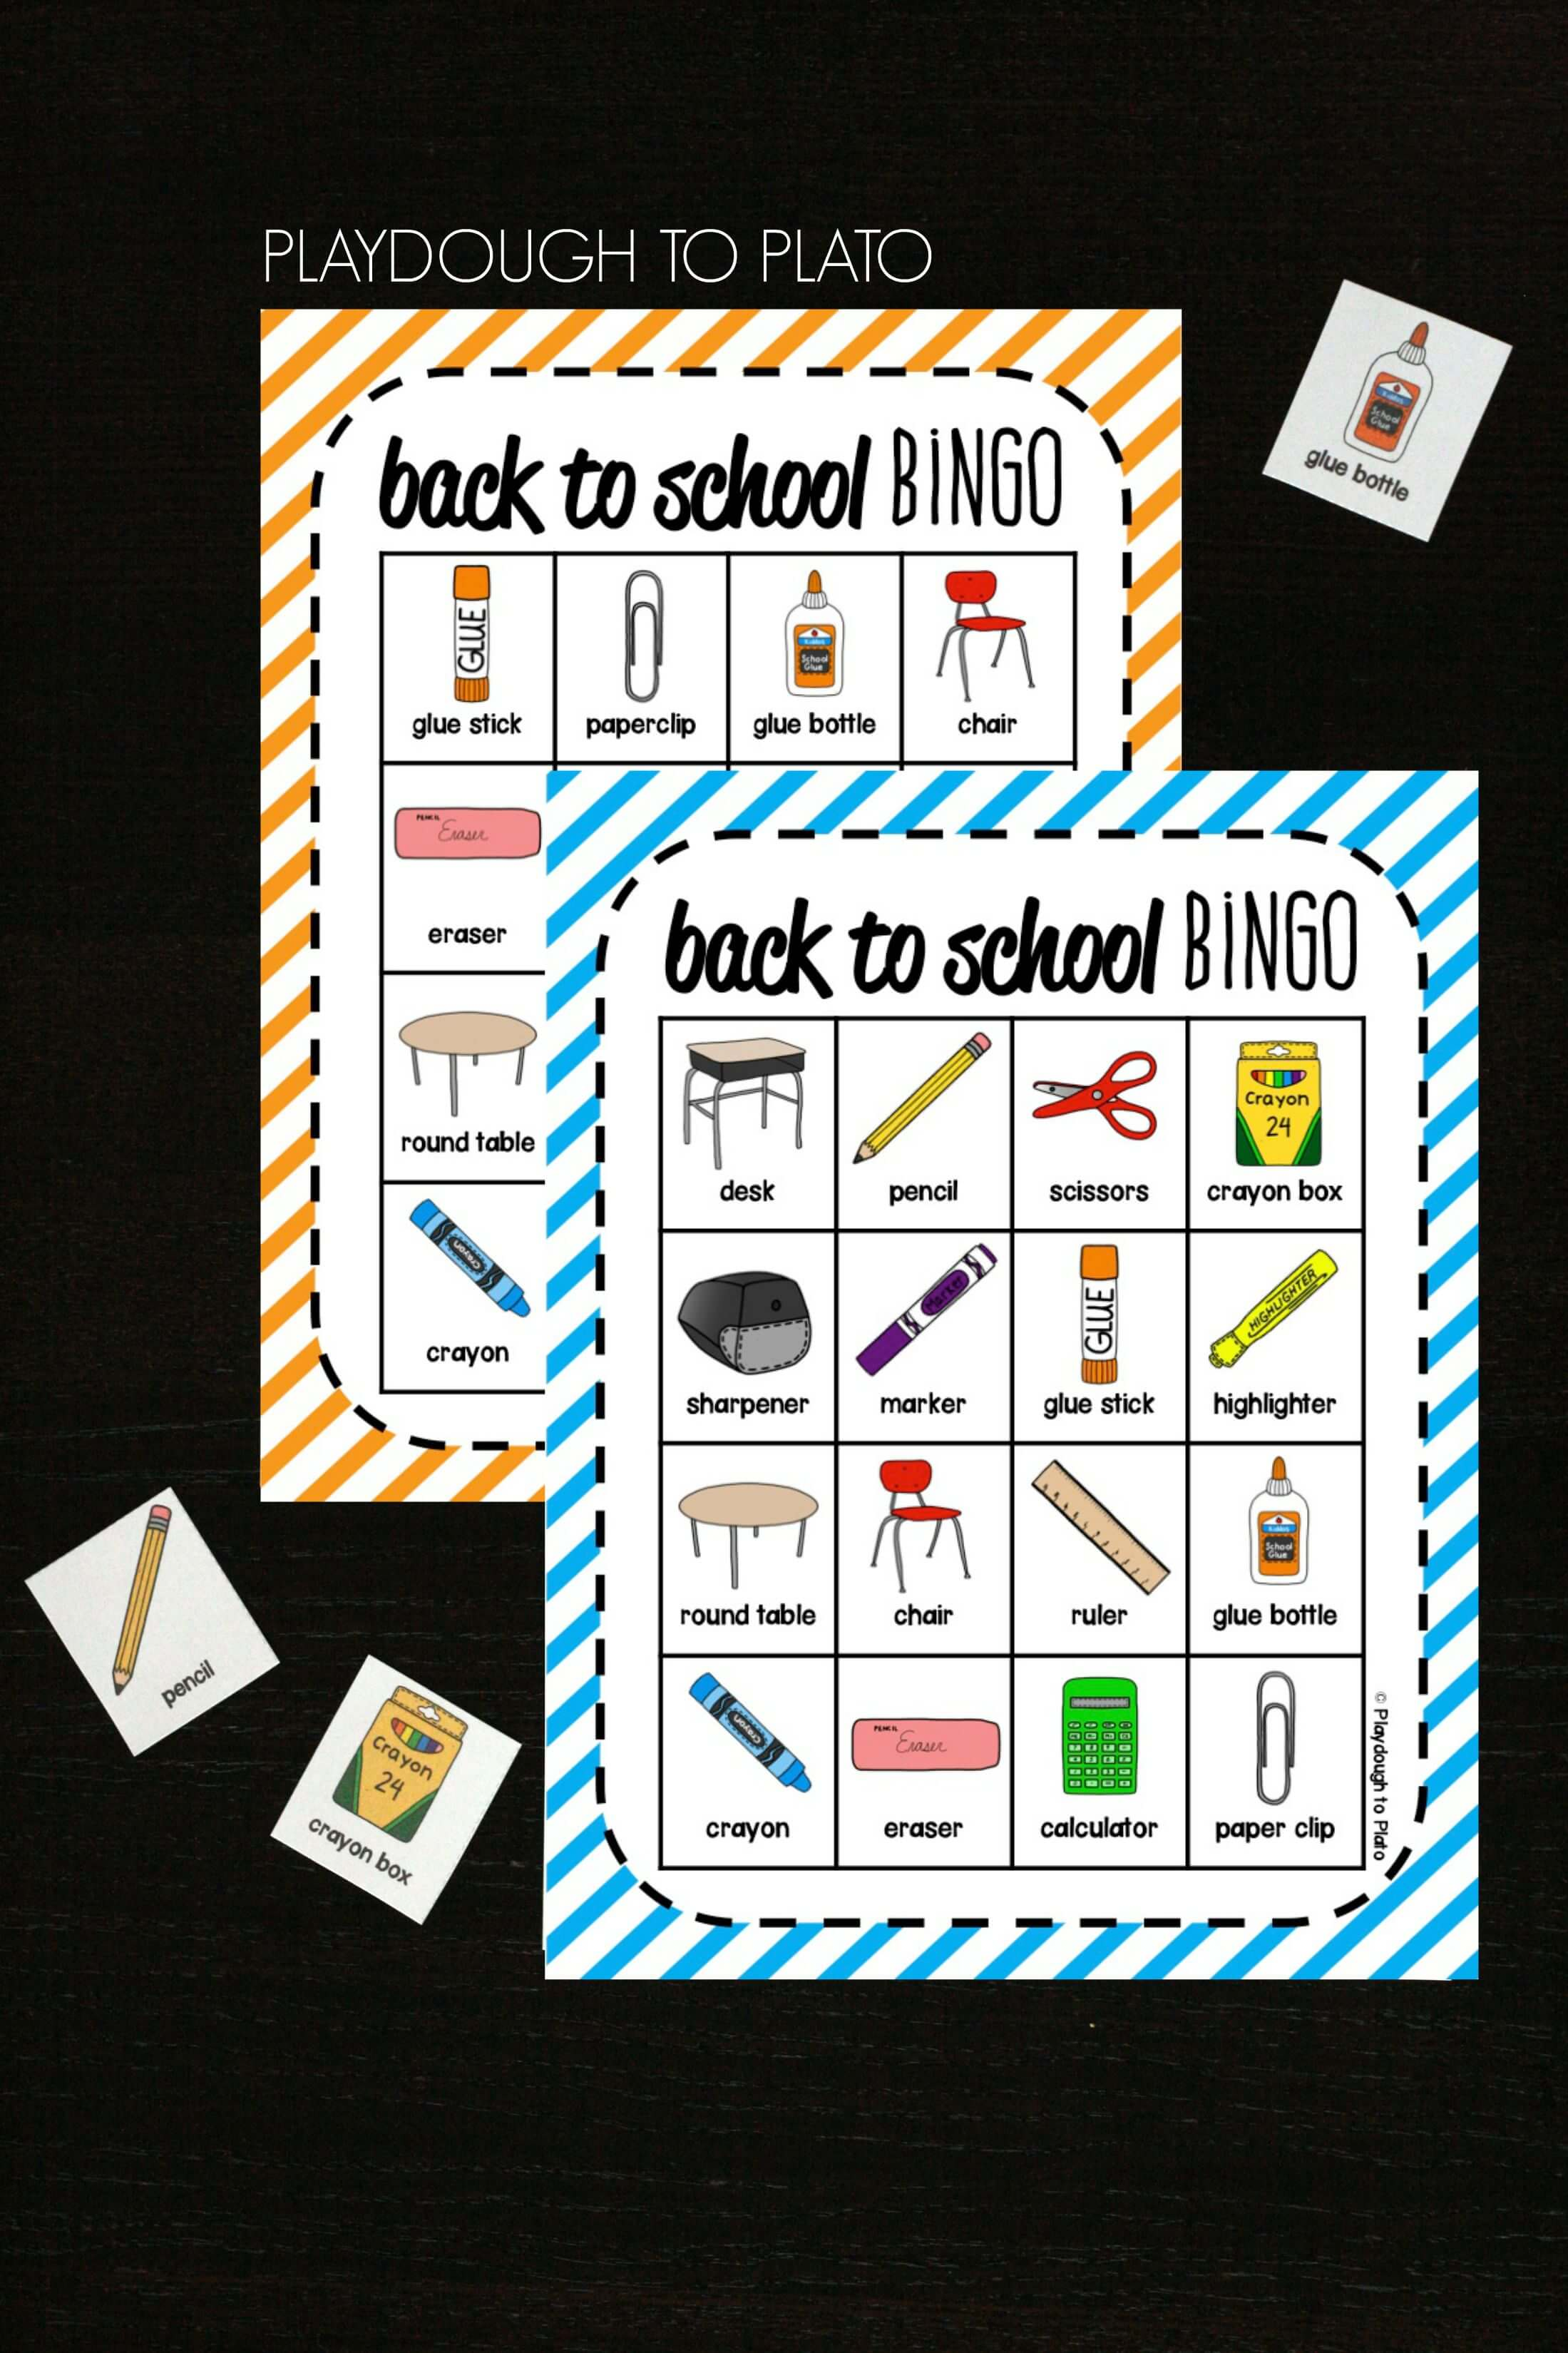 image relating to Back to School Bingo Printable called Again towards College Bingo - Playdough Toward Plato